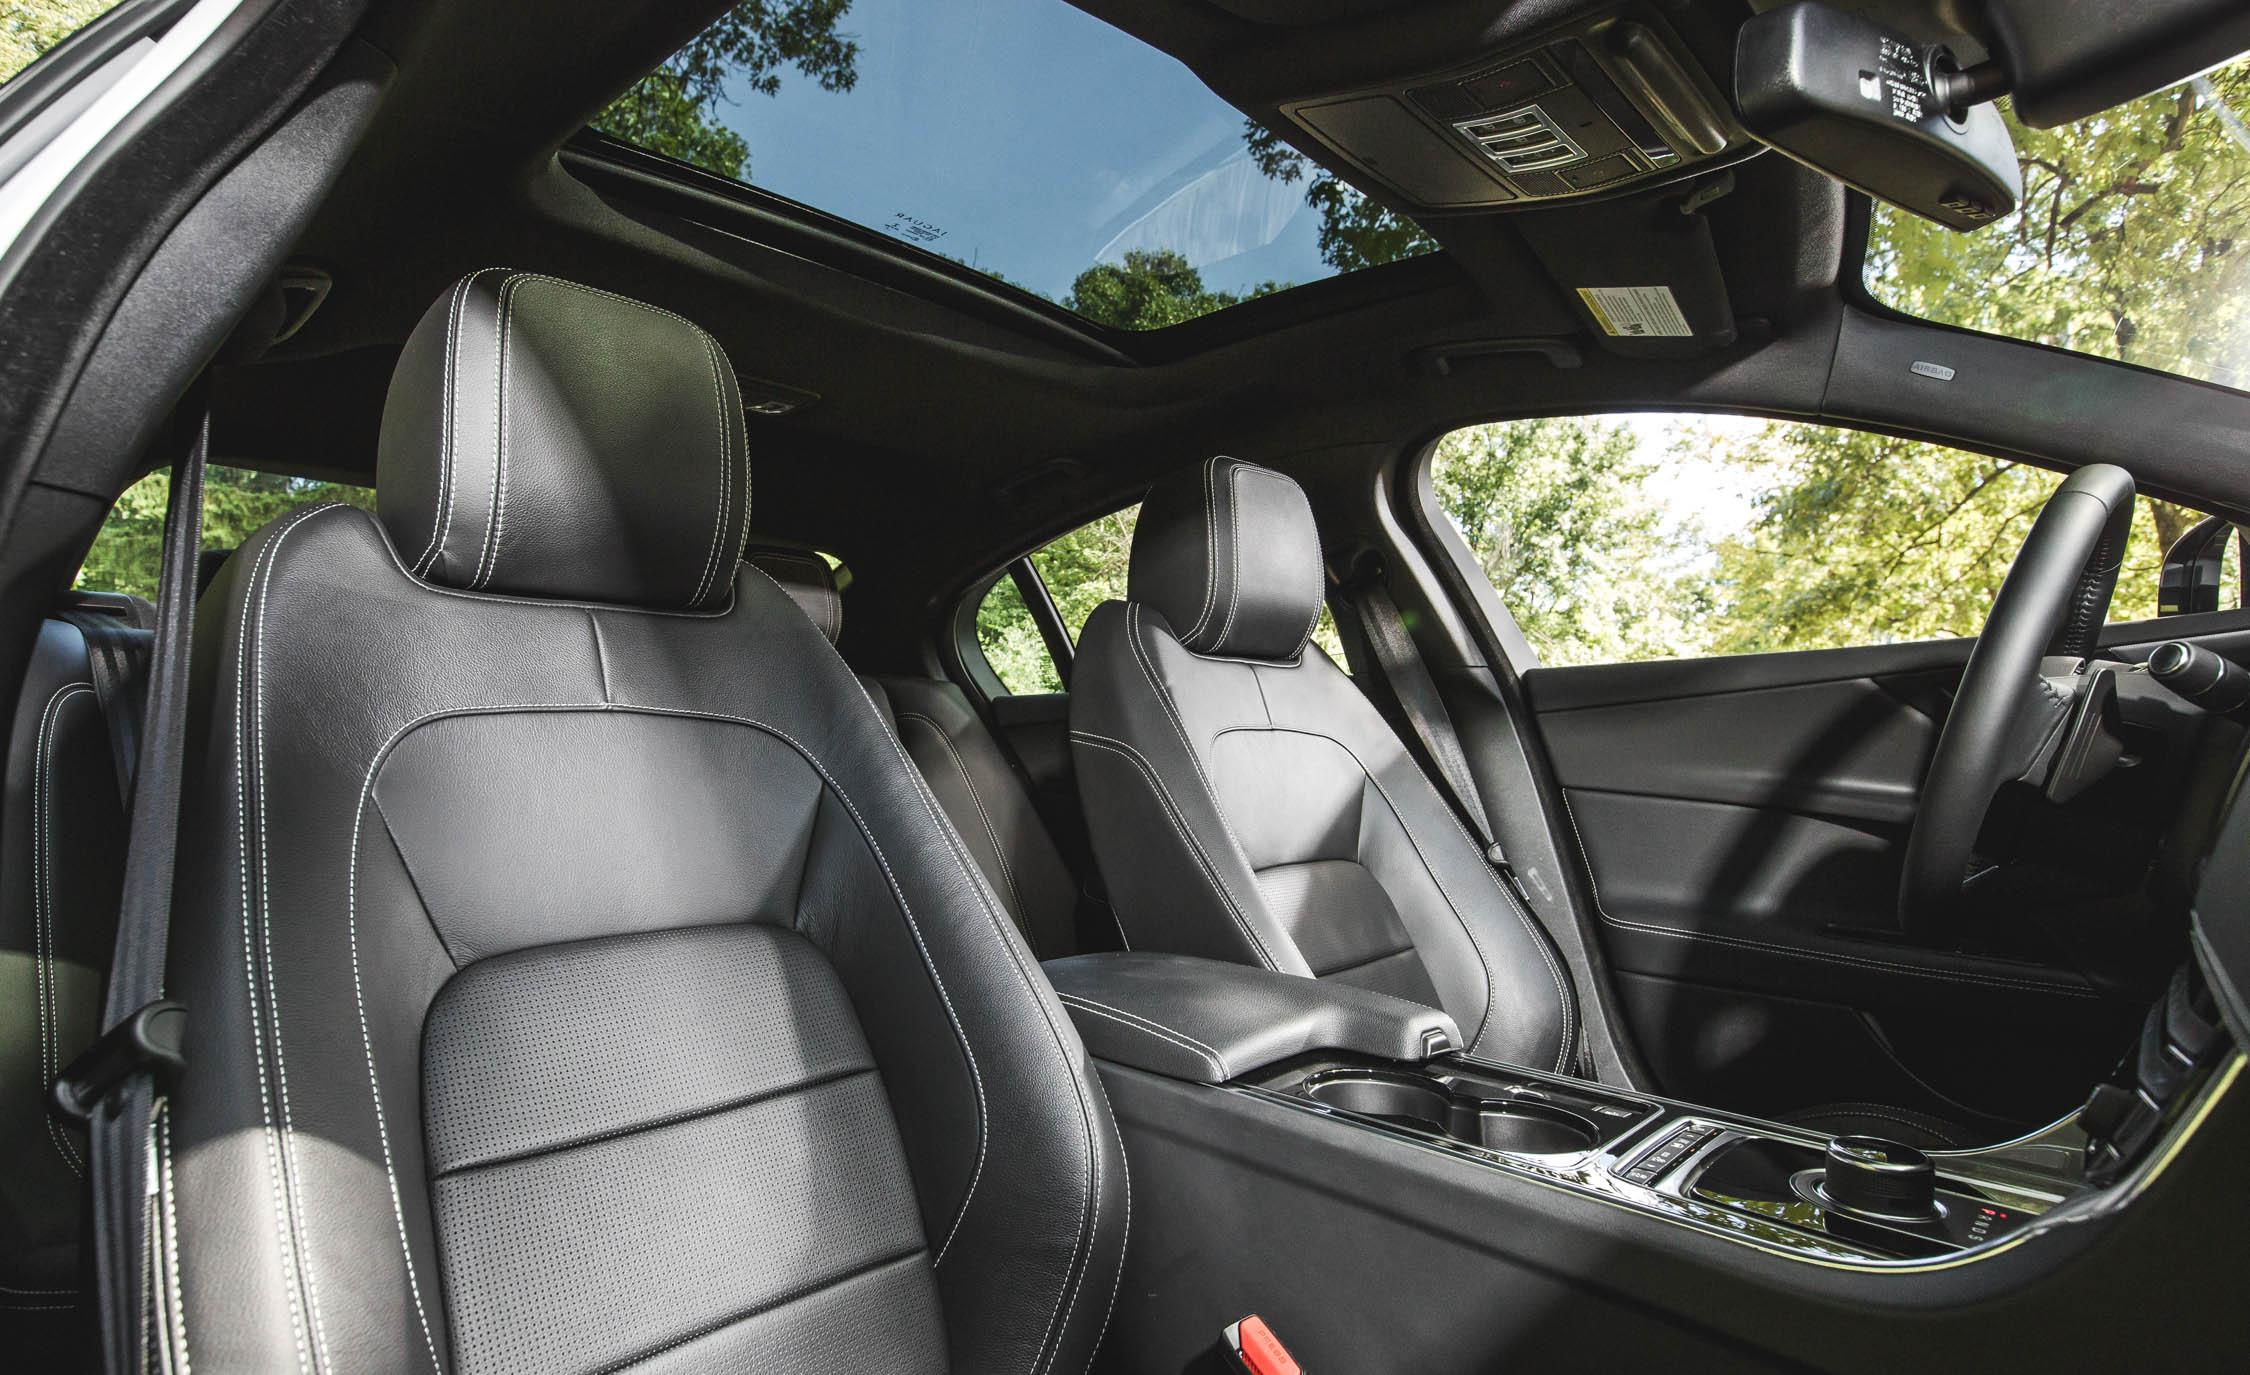 2017 Jaguar Xe Interior Seats (View 12 of 32)